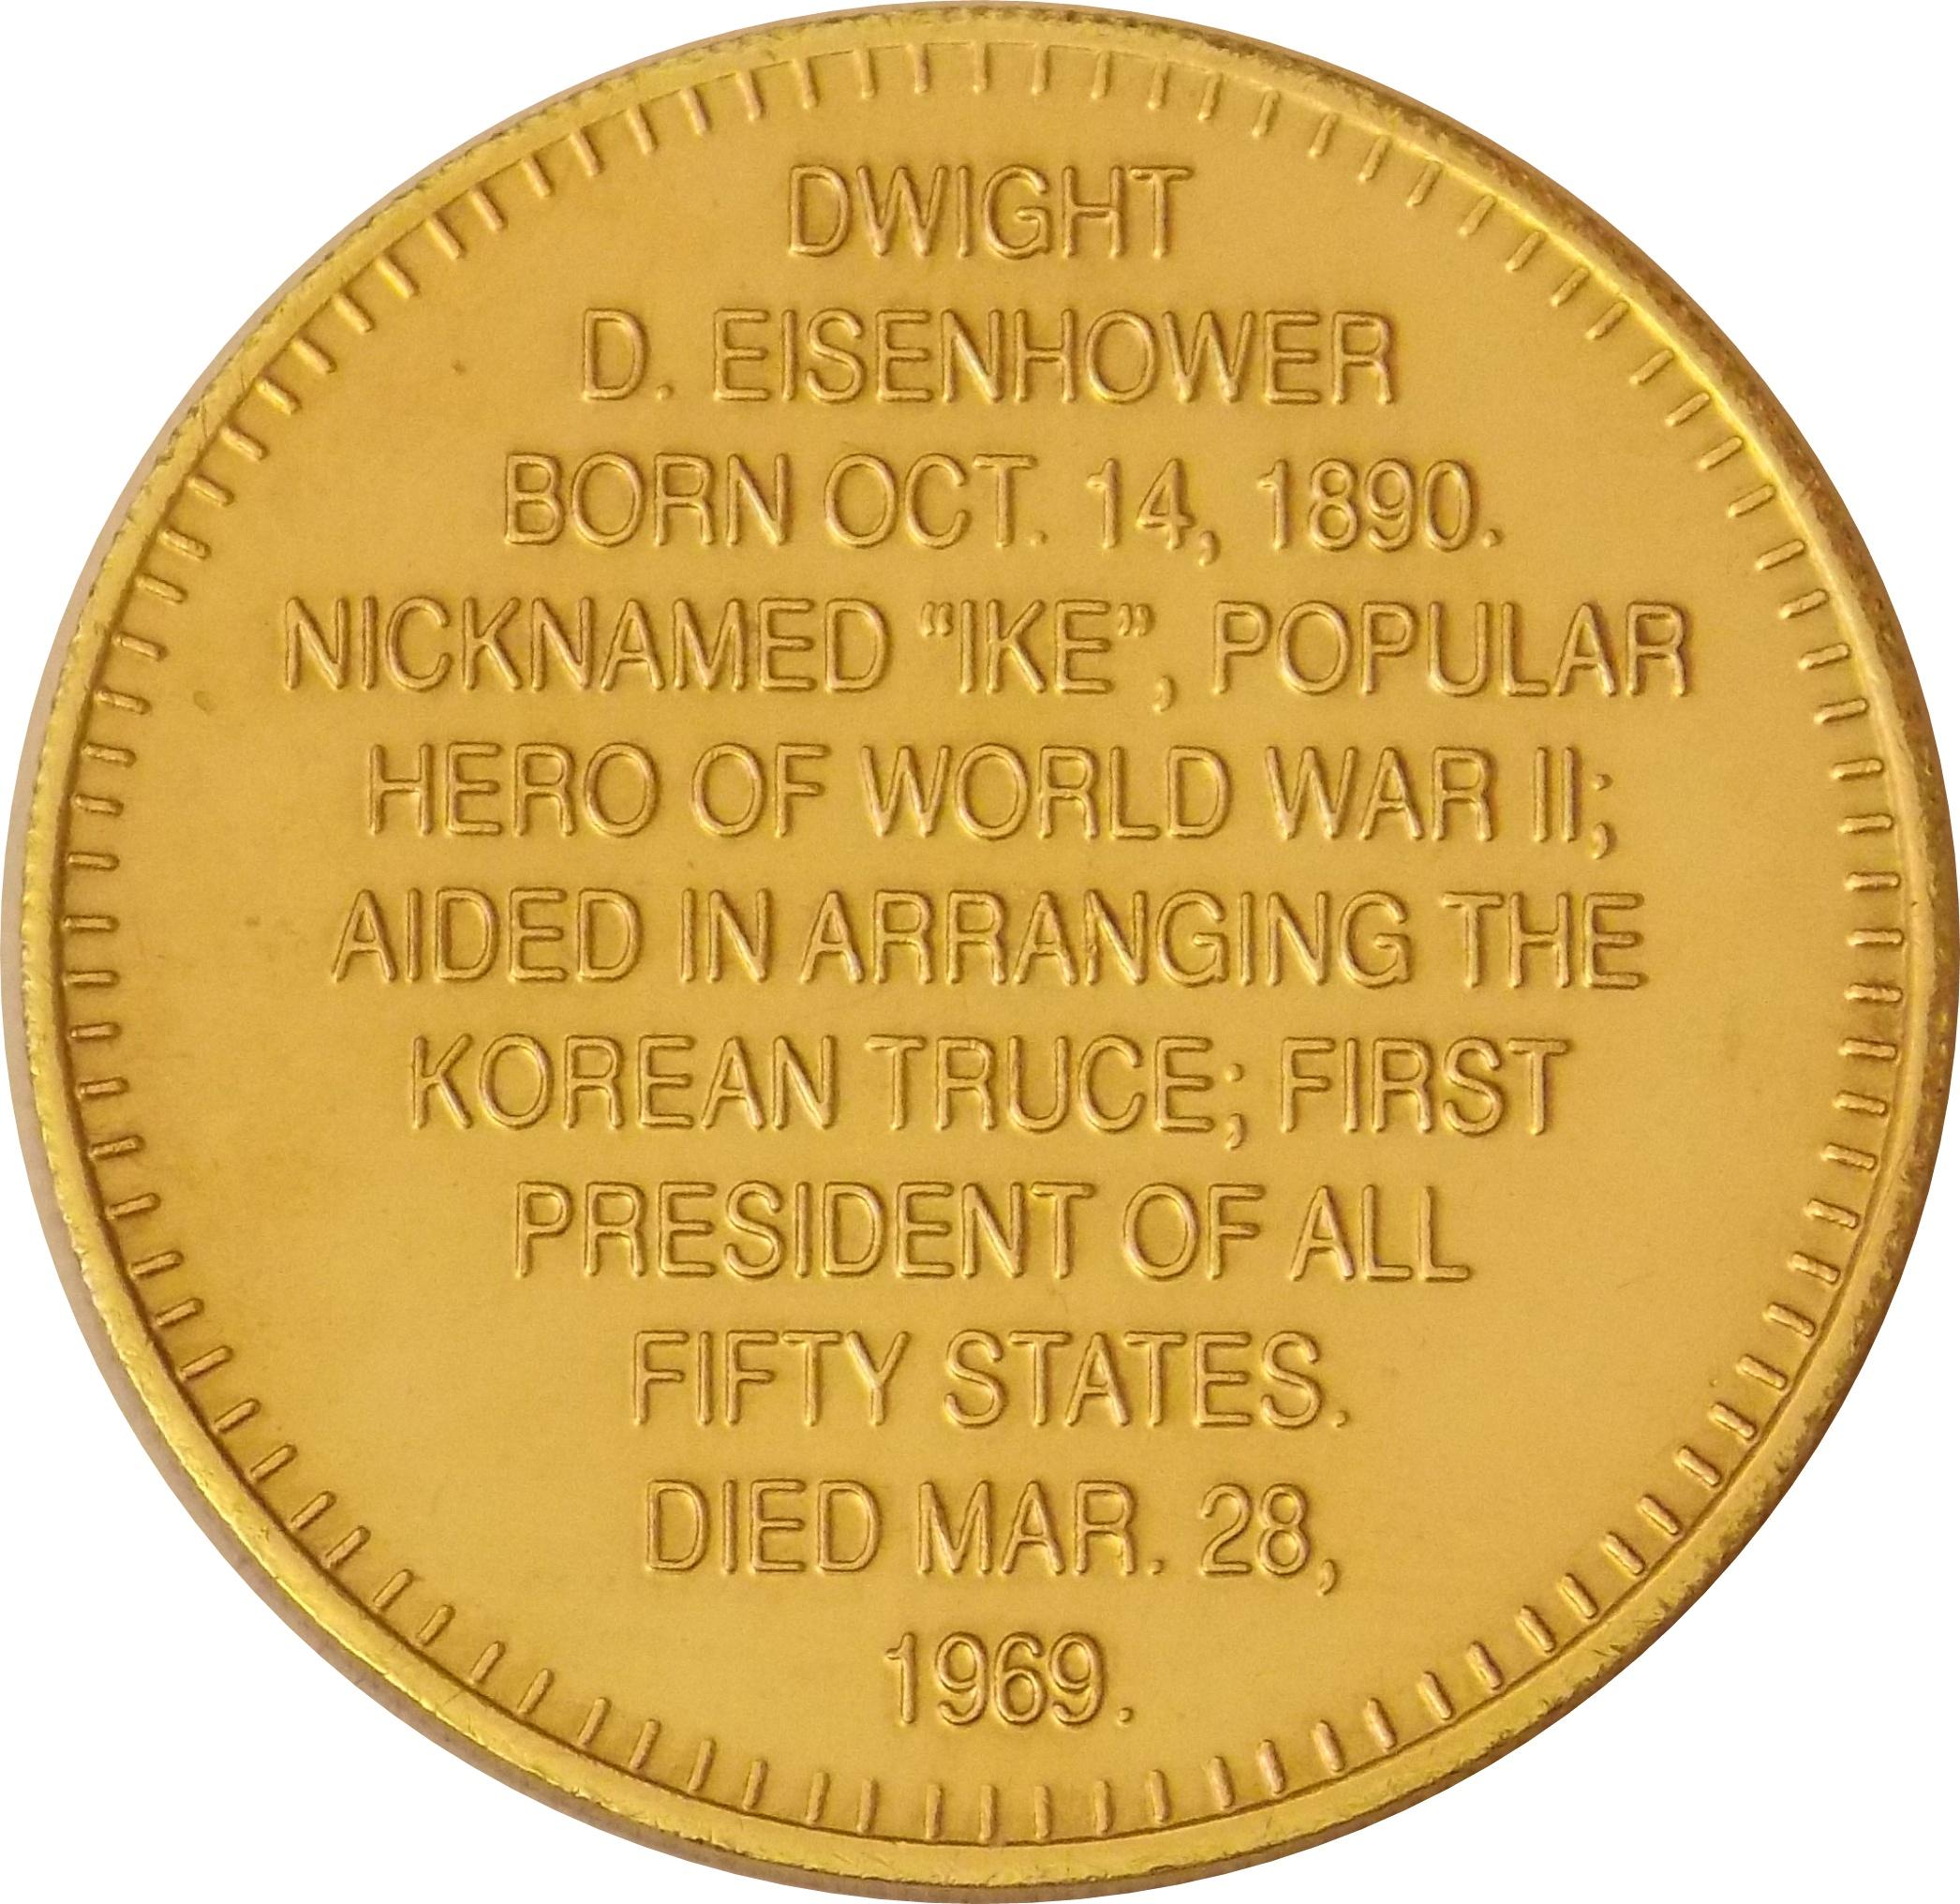 EISENHOWER 1953-1961 Commemorative Token Collectible President DWIGHT D